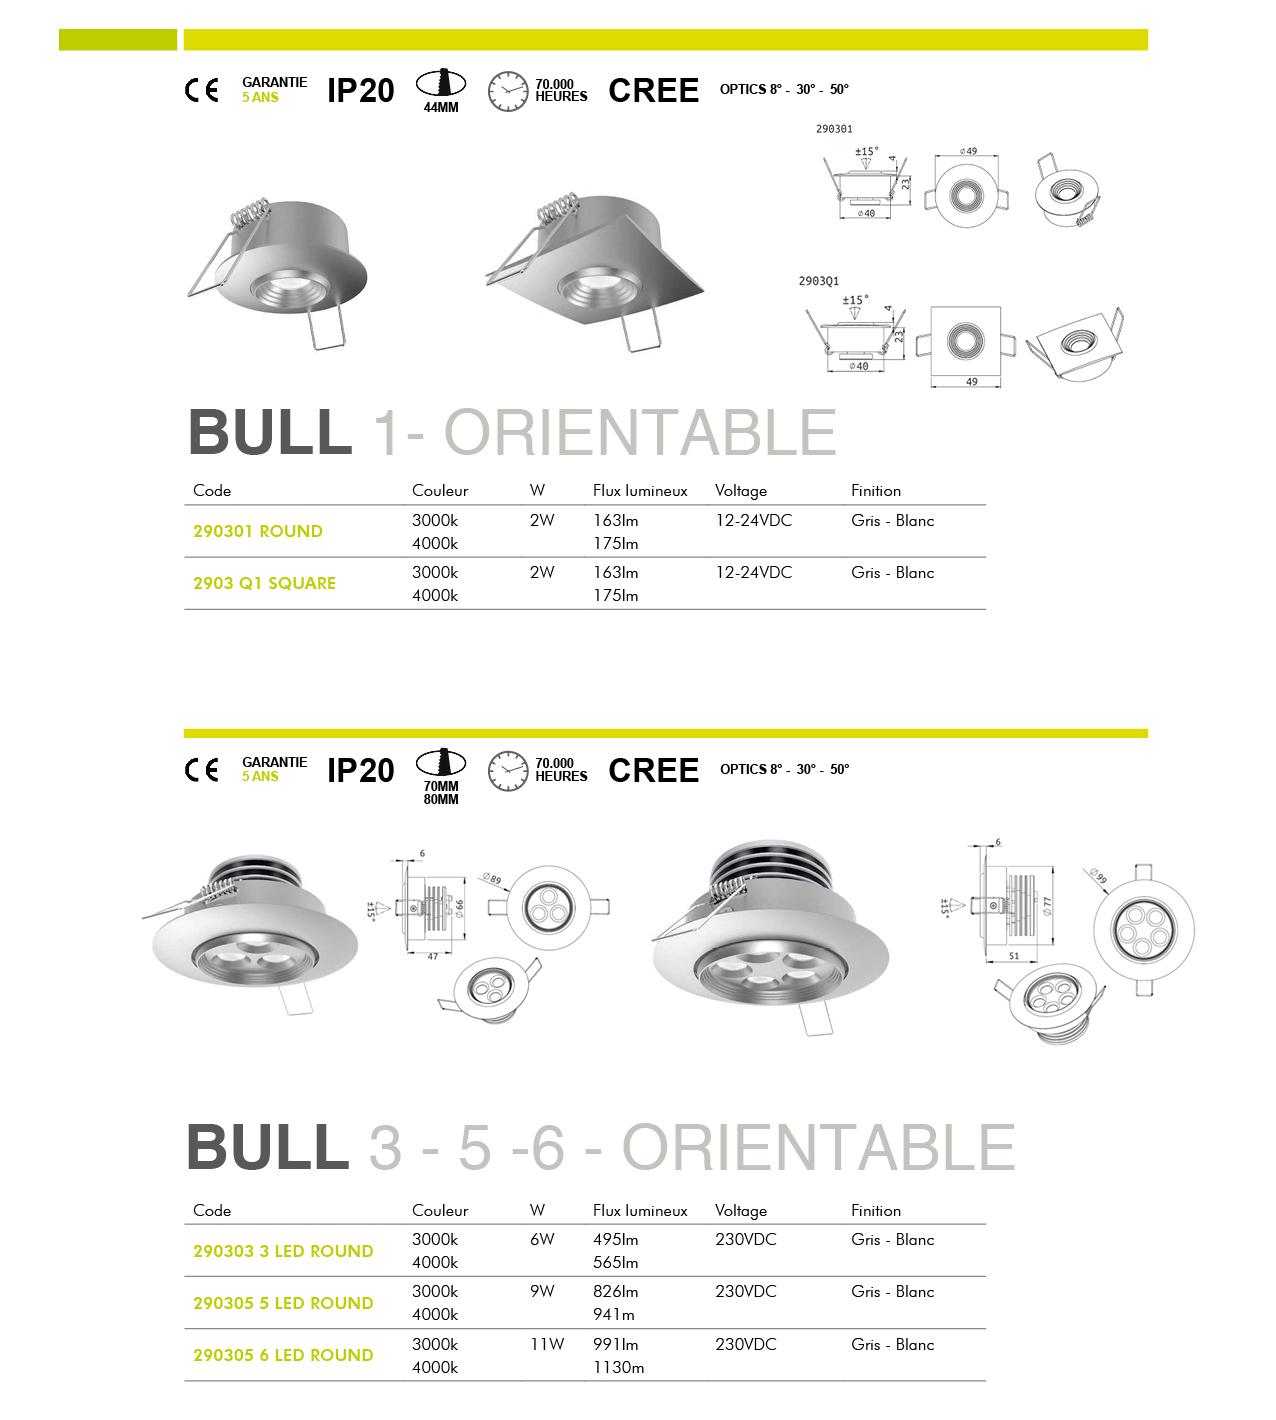 DEF-catalogue-gheury-23-06-201711